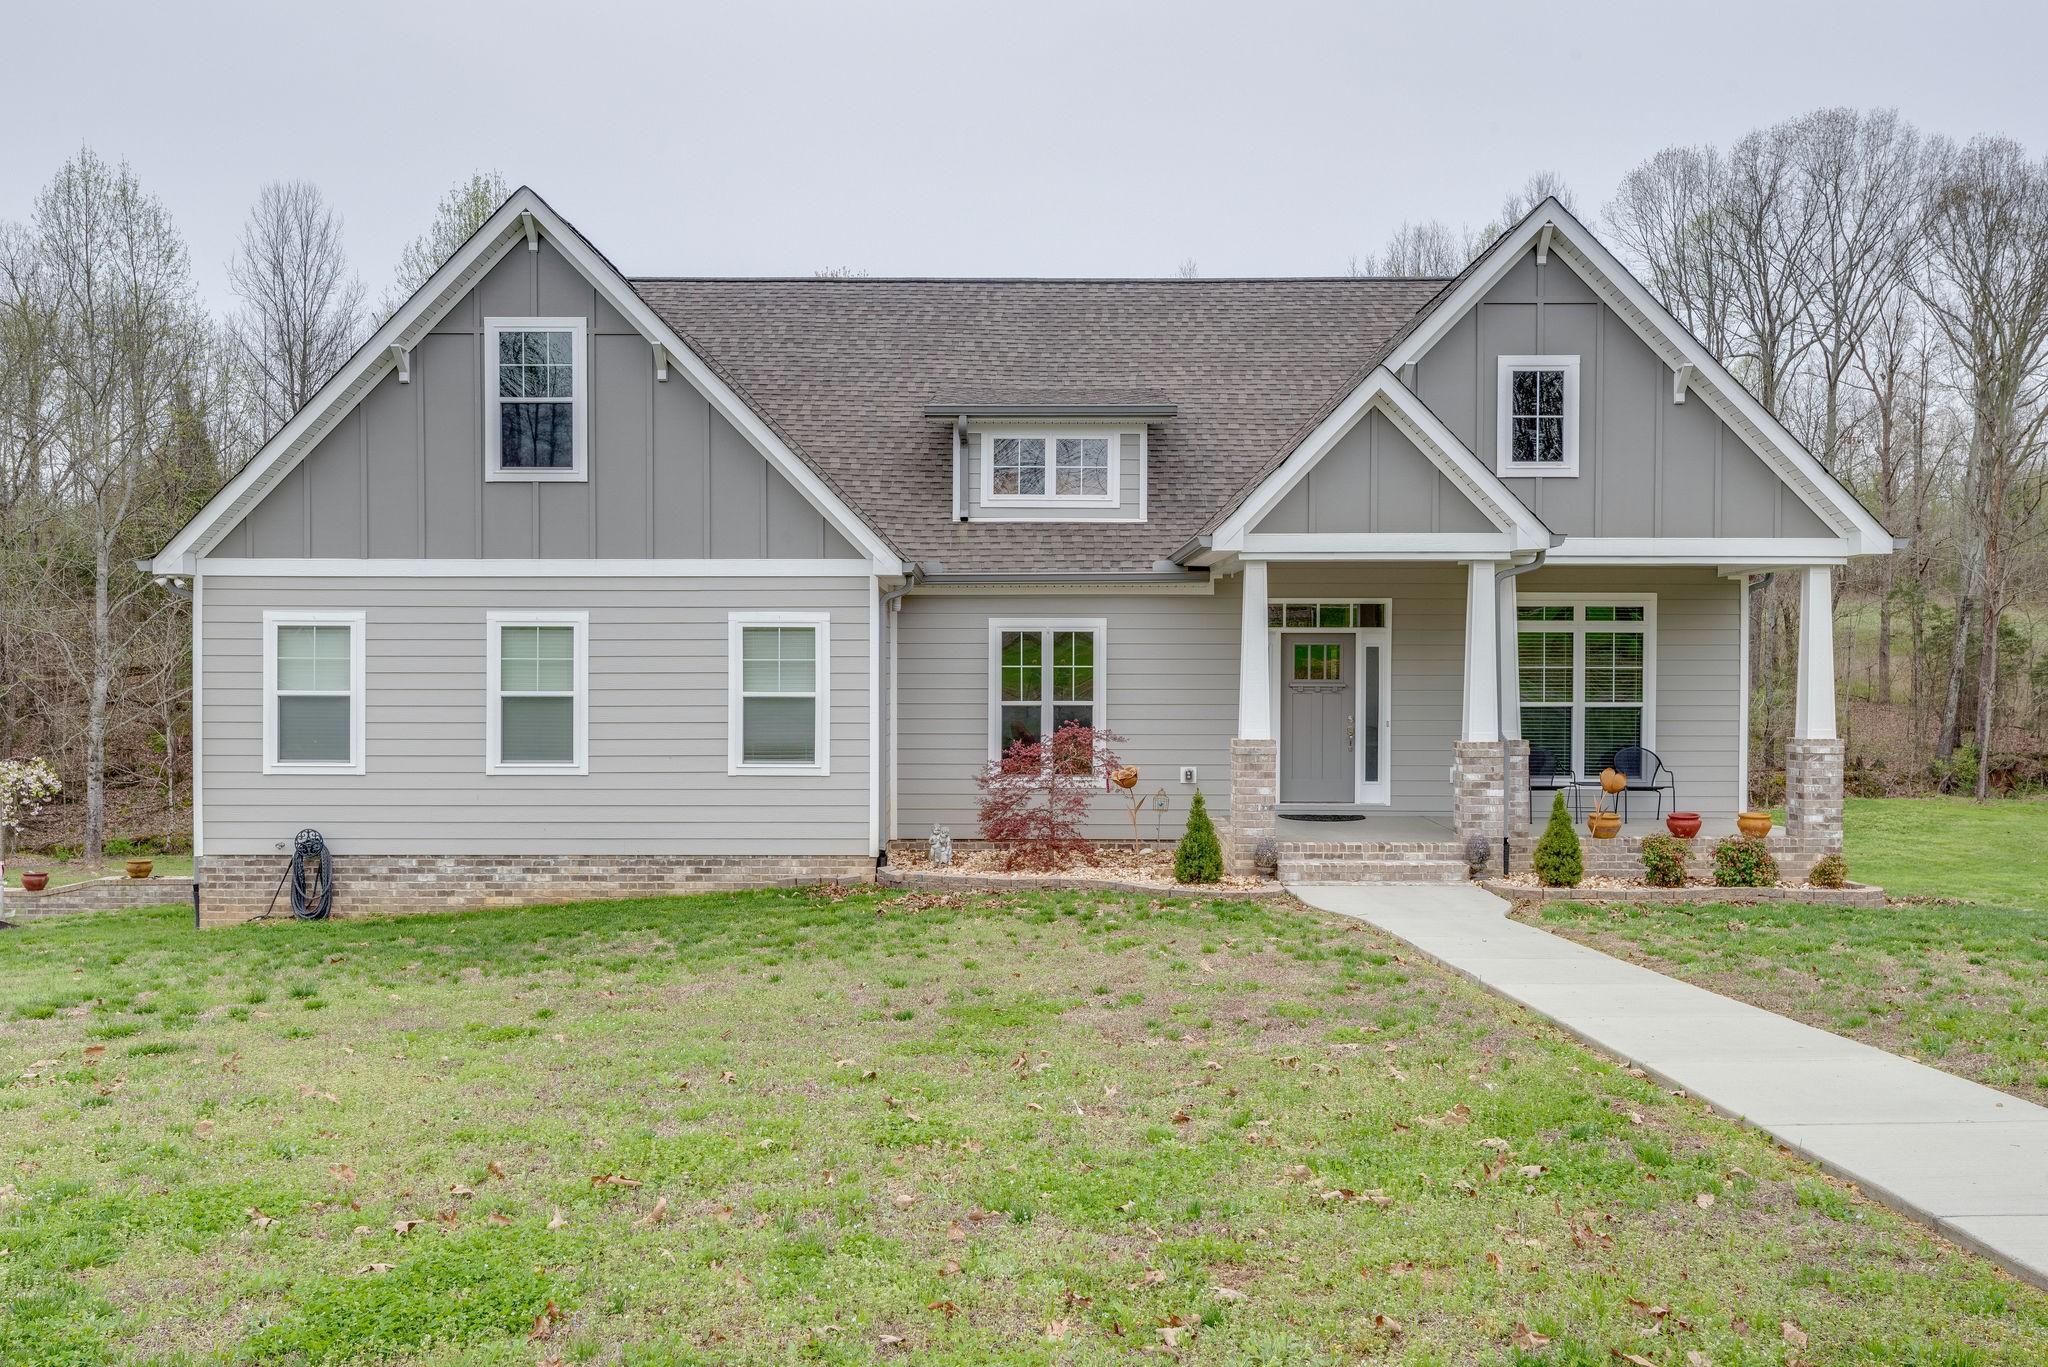 208 Highland Ln, Burns, TN 37029 - Burns, TN real estate listing